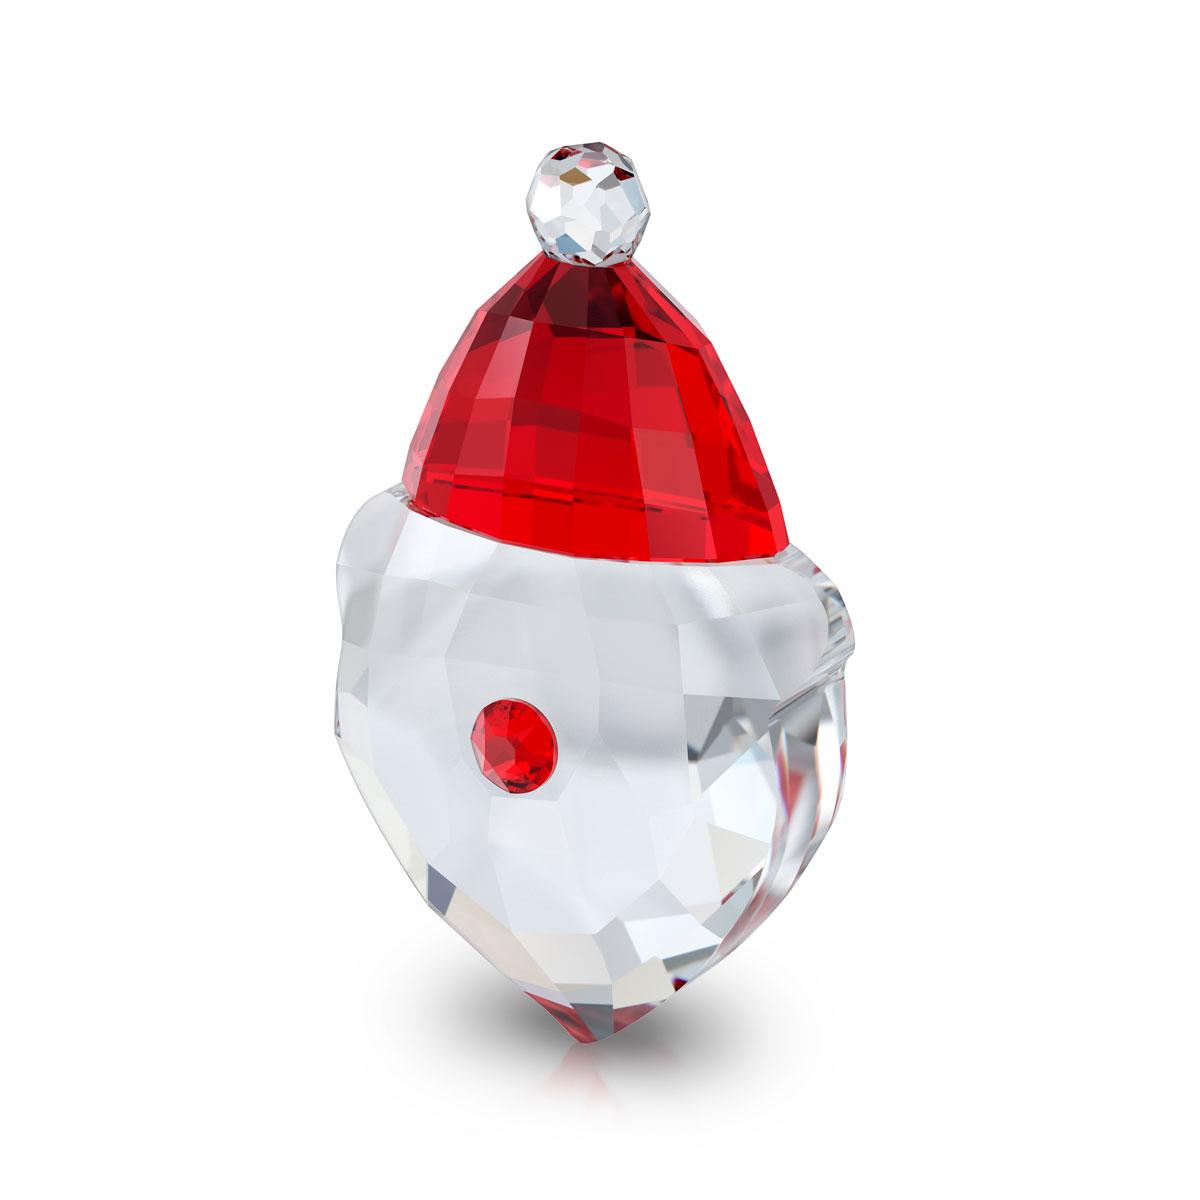 Swarovski Holiday Cheers Magnet Santa Claus